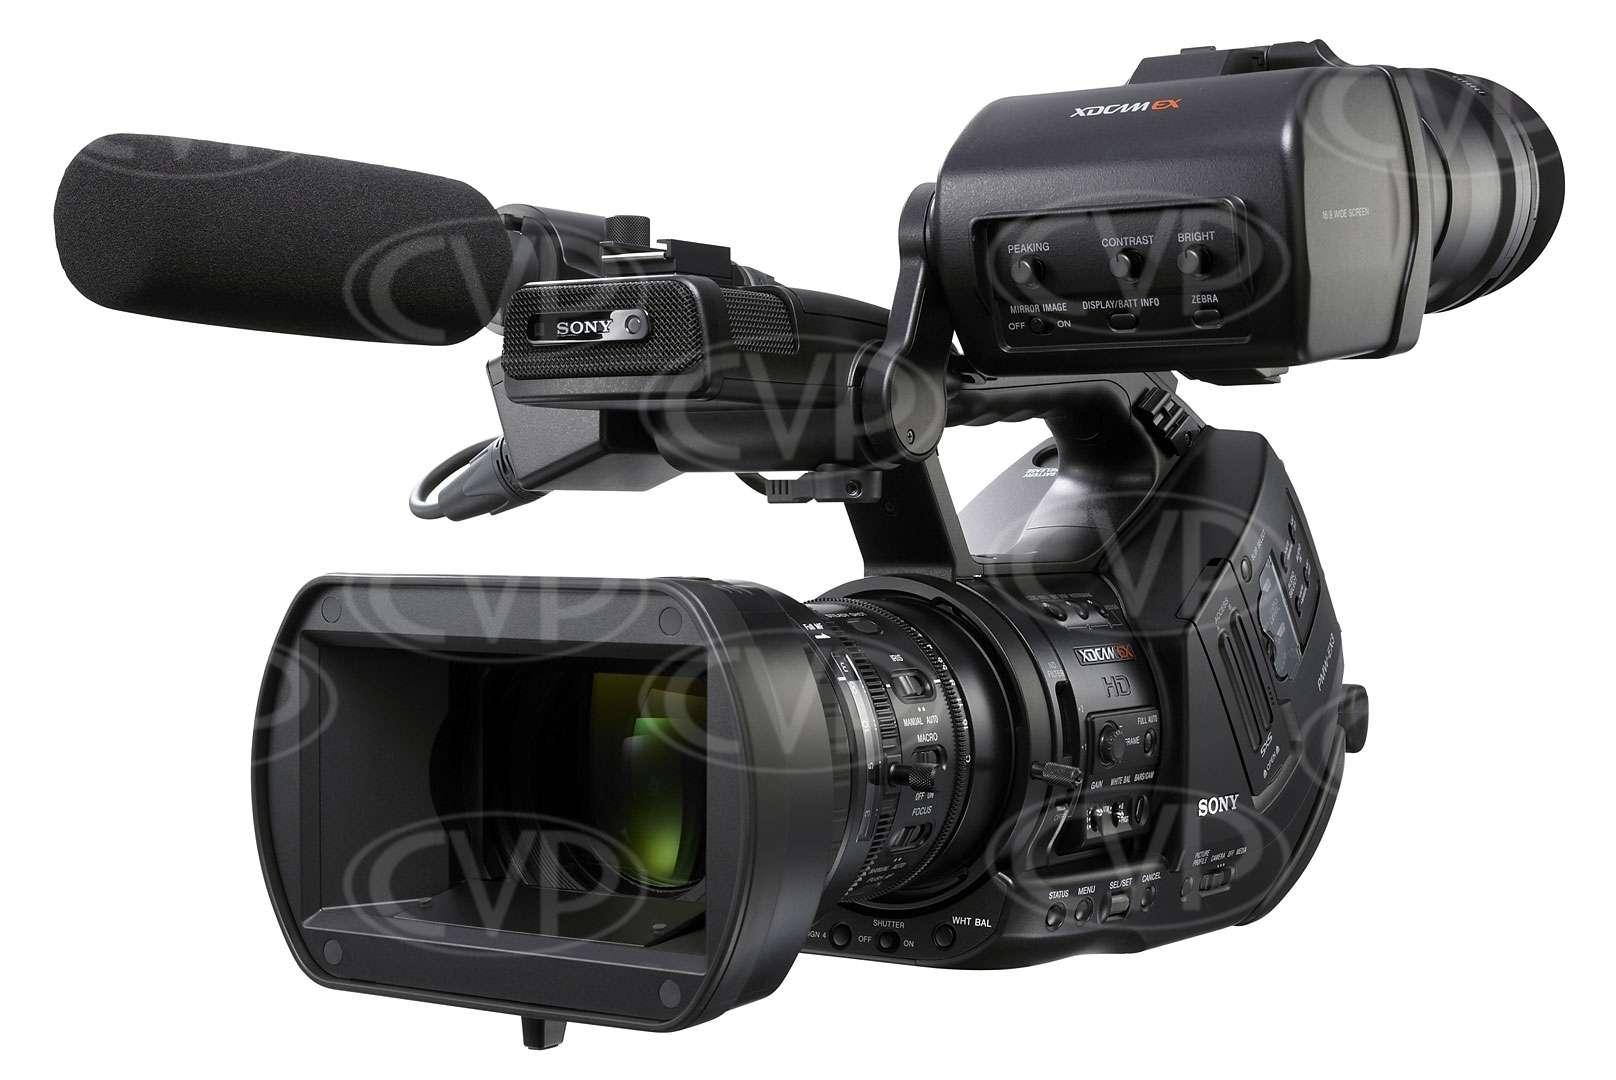 buy sony pmw ex3 pmwex3 pmw ex3 4 pmwex3 4 full hd 3 cmos rh cvp com sony nex-3 with manual lenses sony nex 3 manual